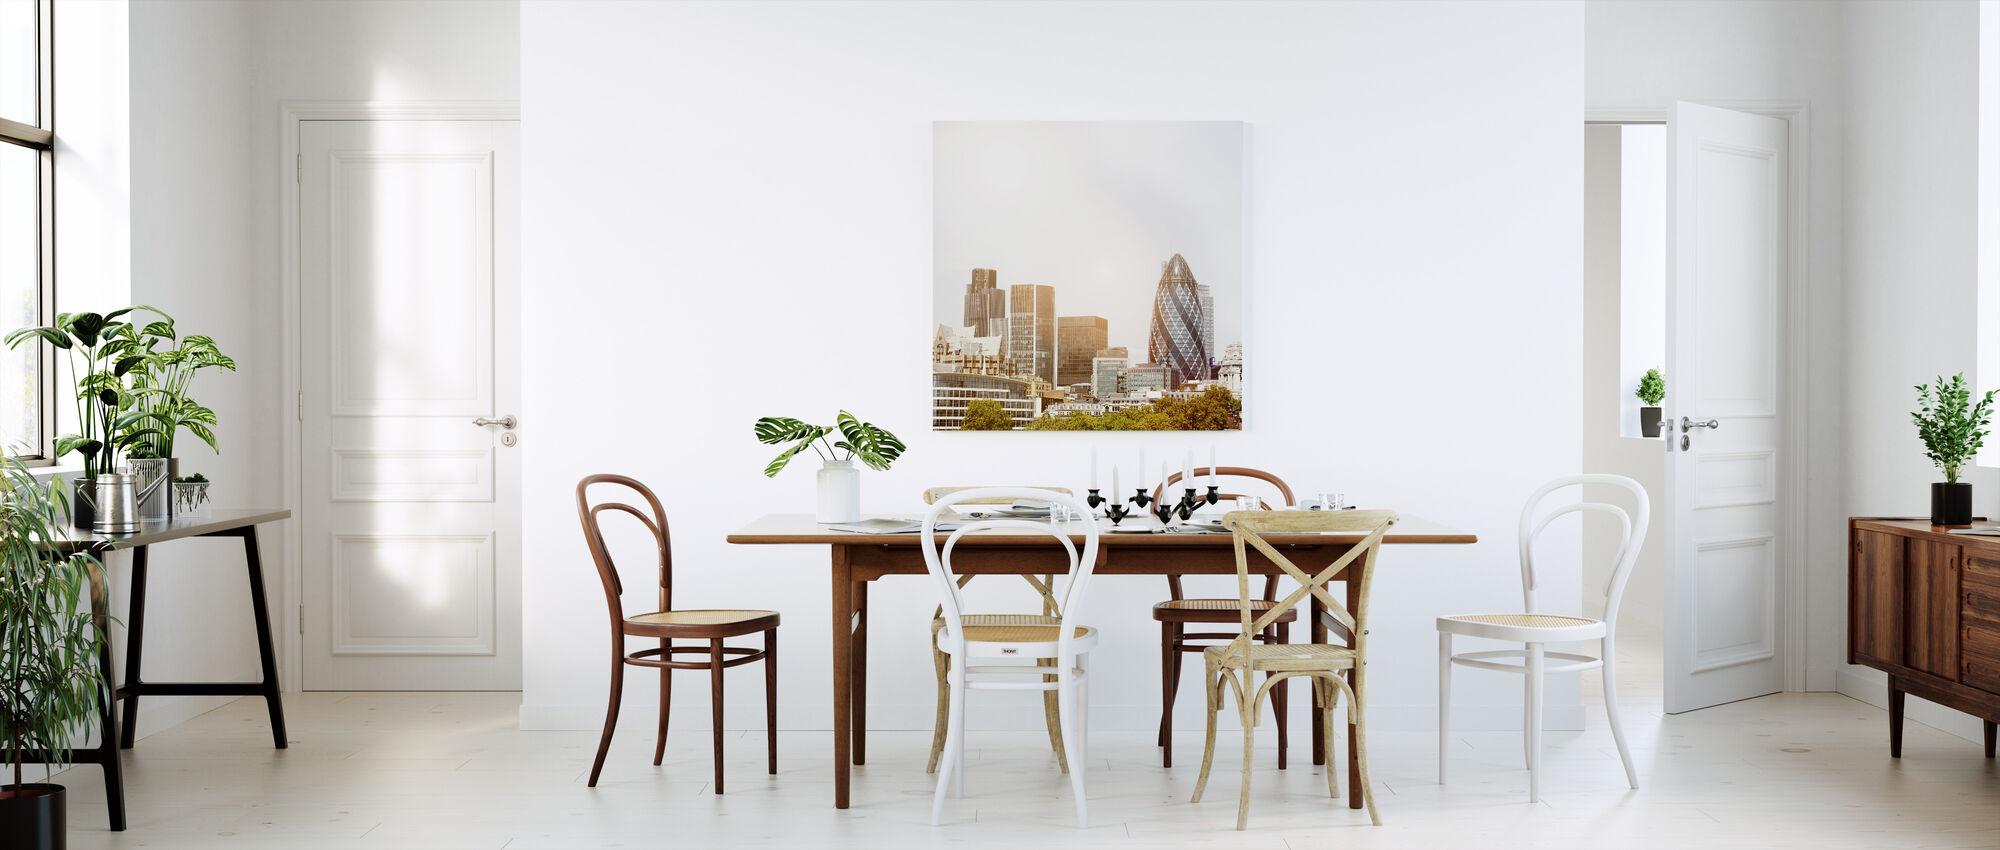 London Skyline at Daybreak - Canvas print - Kitchen